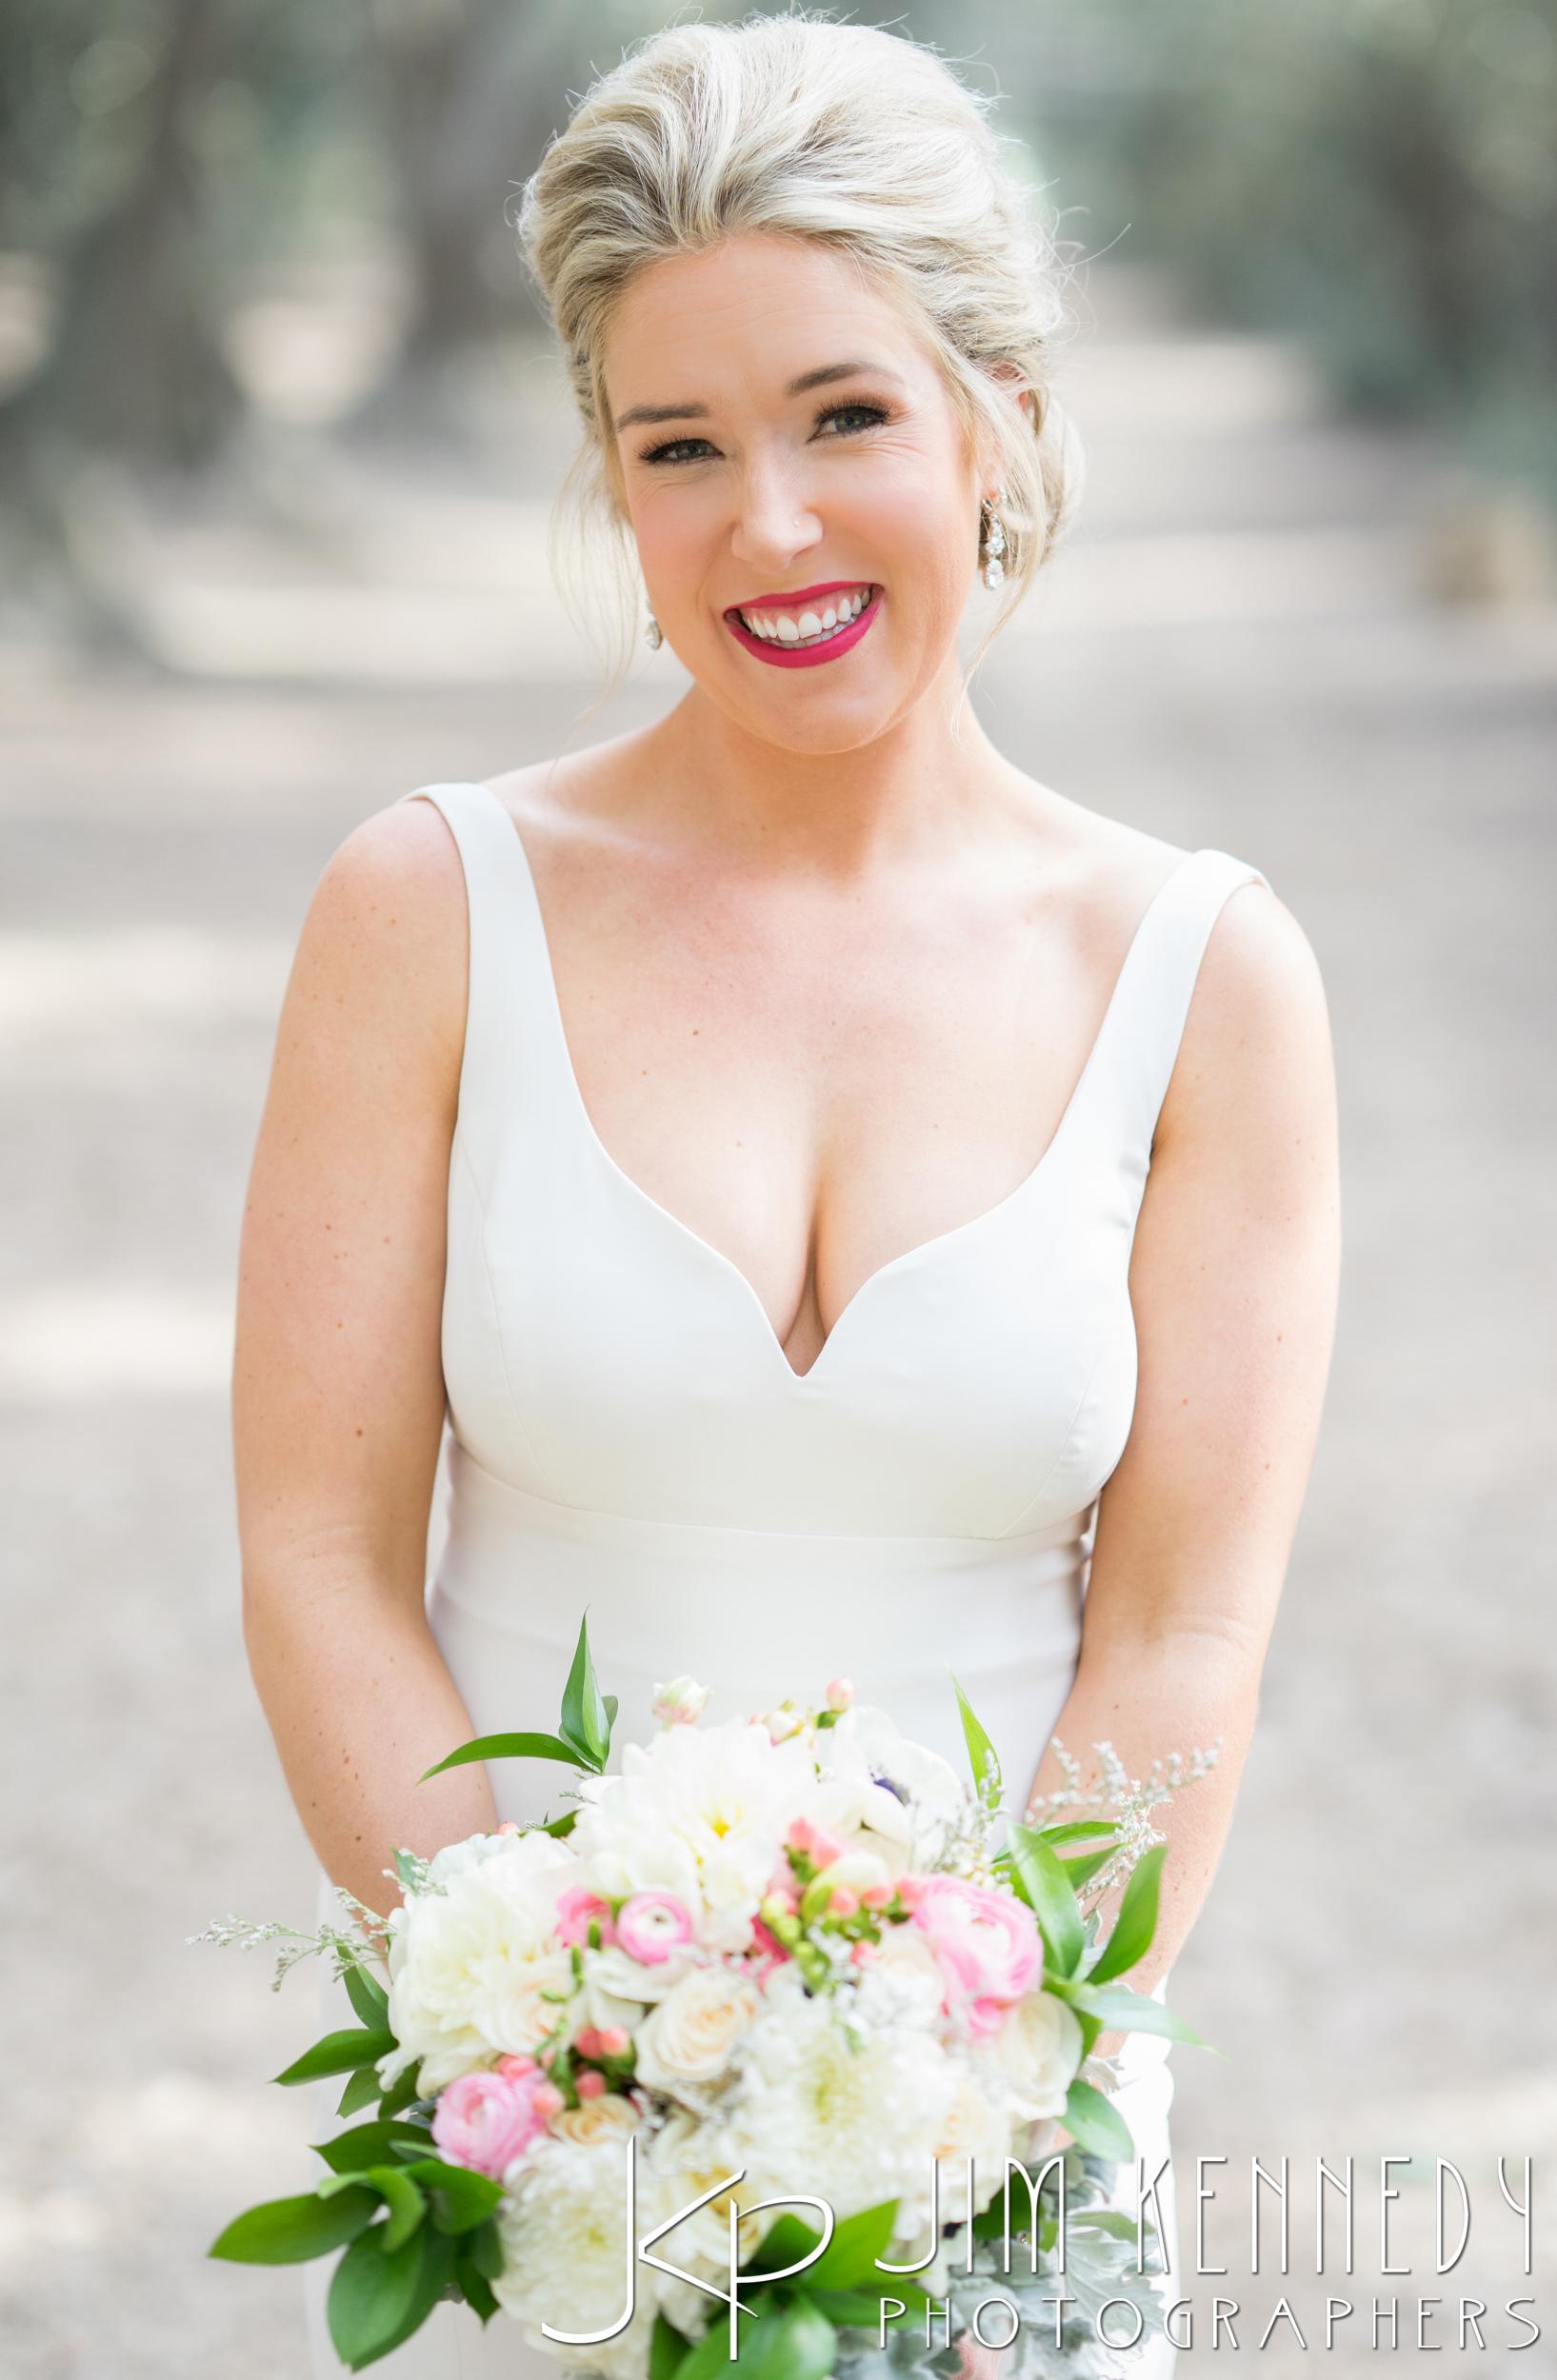 jim_kennedy_photographers_highland_springs_wedding_caitlyn_0069.jpg